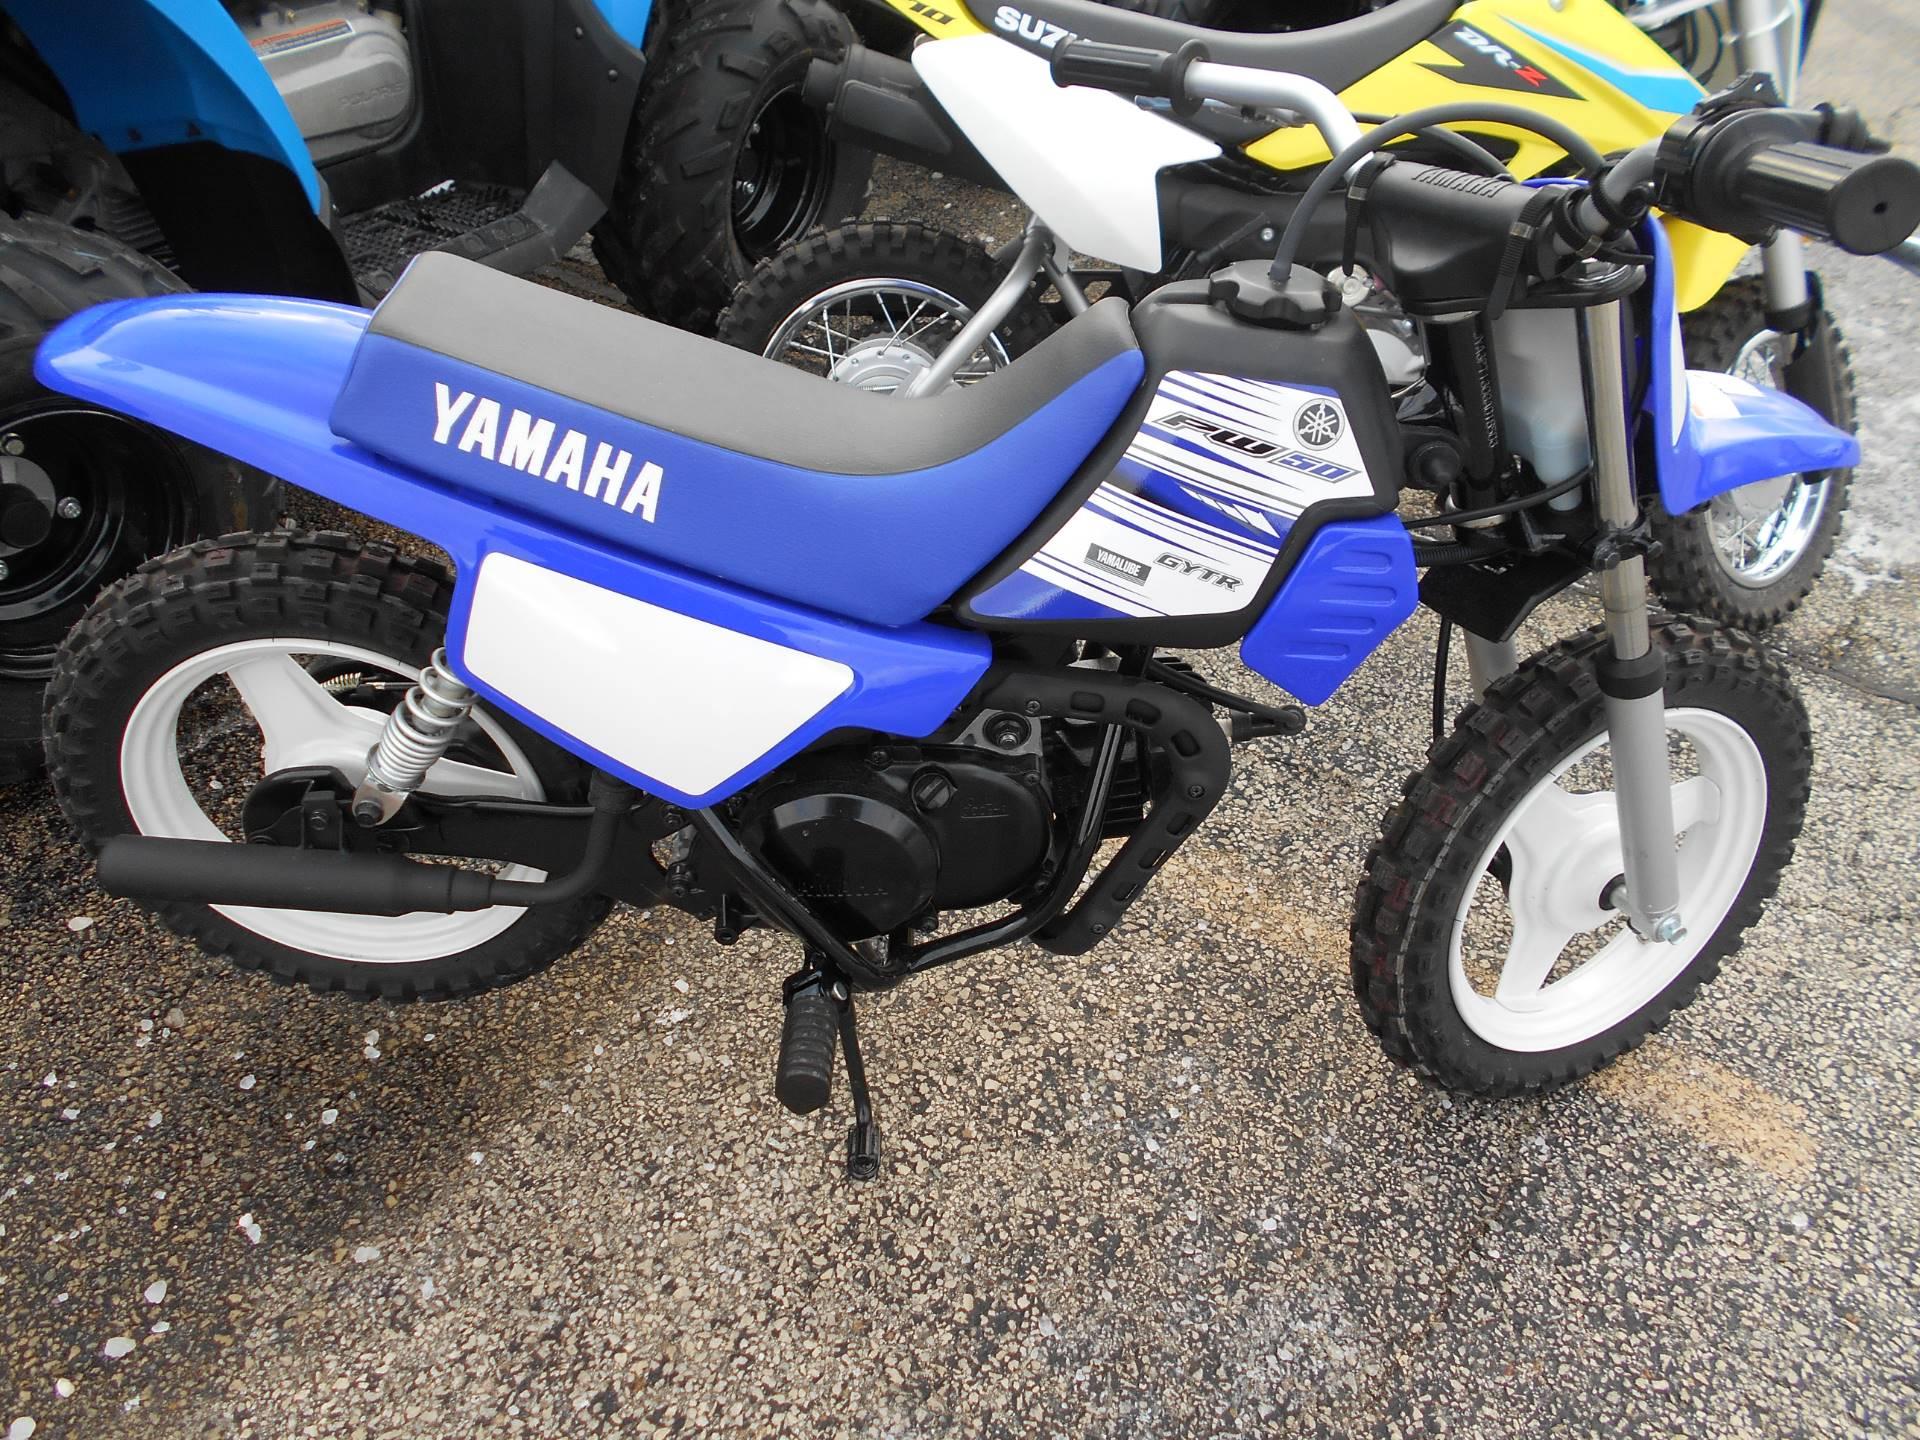 2016 Yamaha PW50 for sale 126592